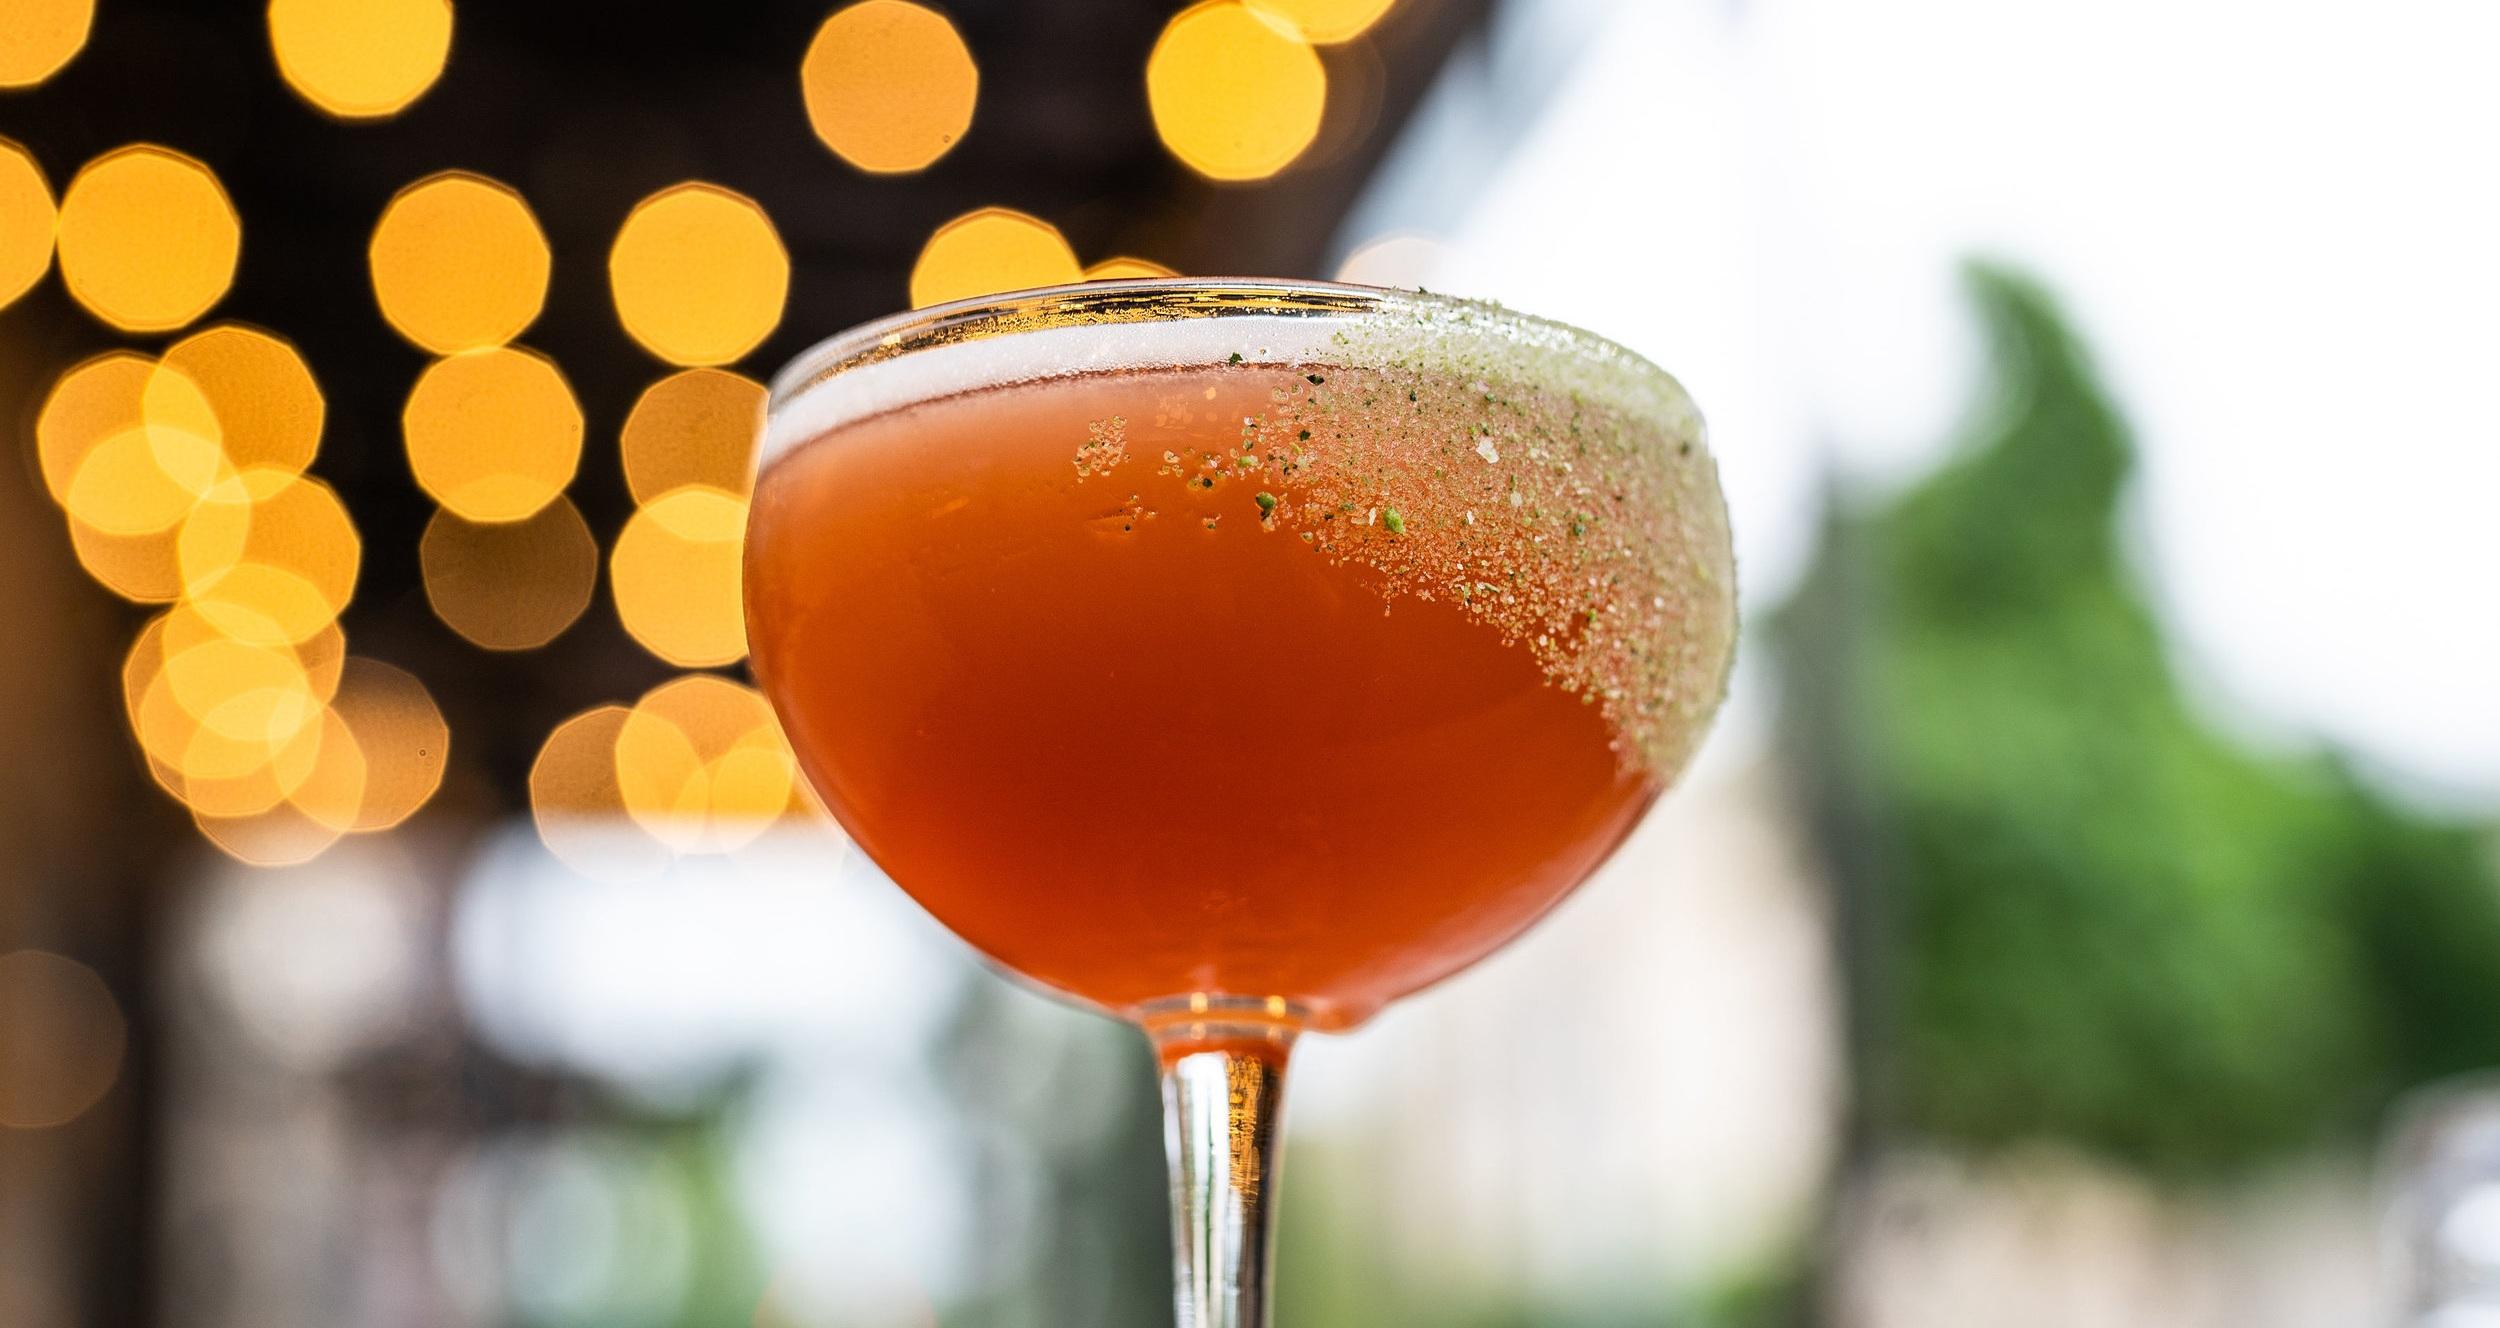 BEBIDAS - enjoy a drink from our award winning team led by James Simpson